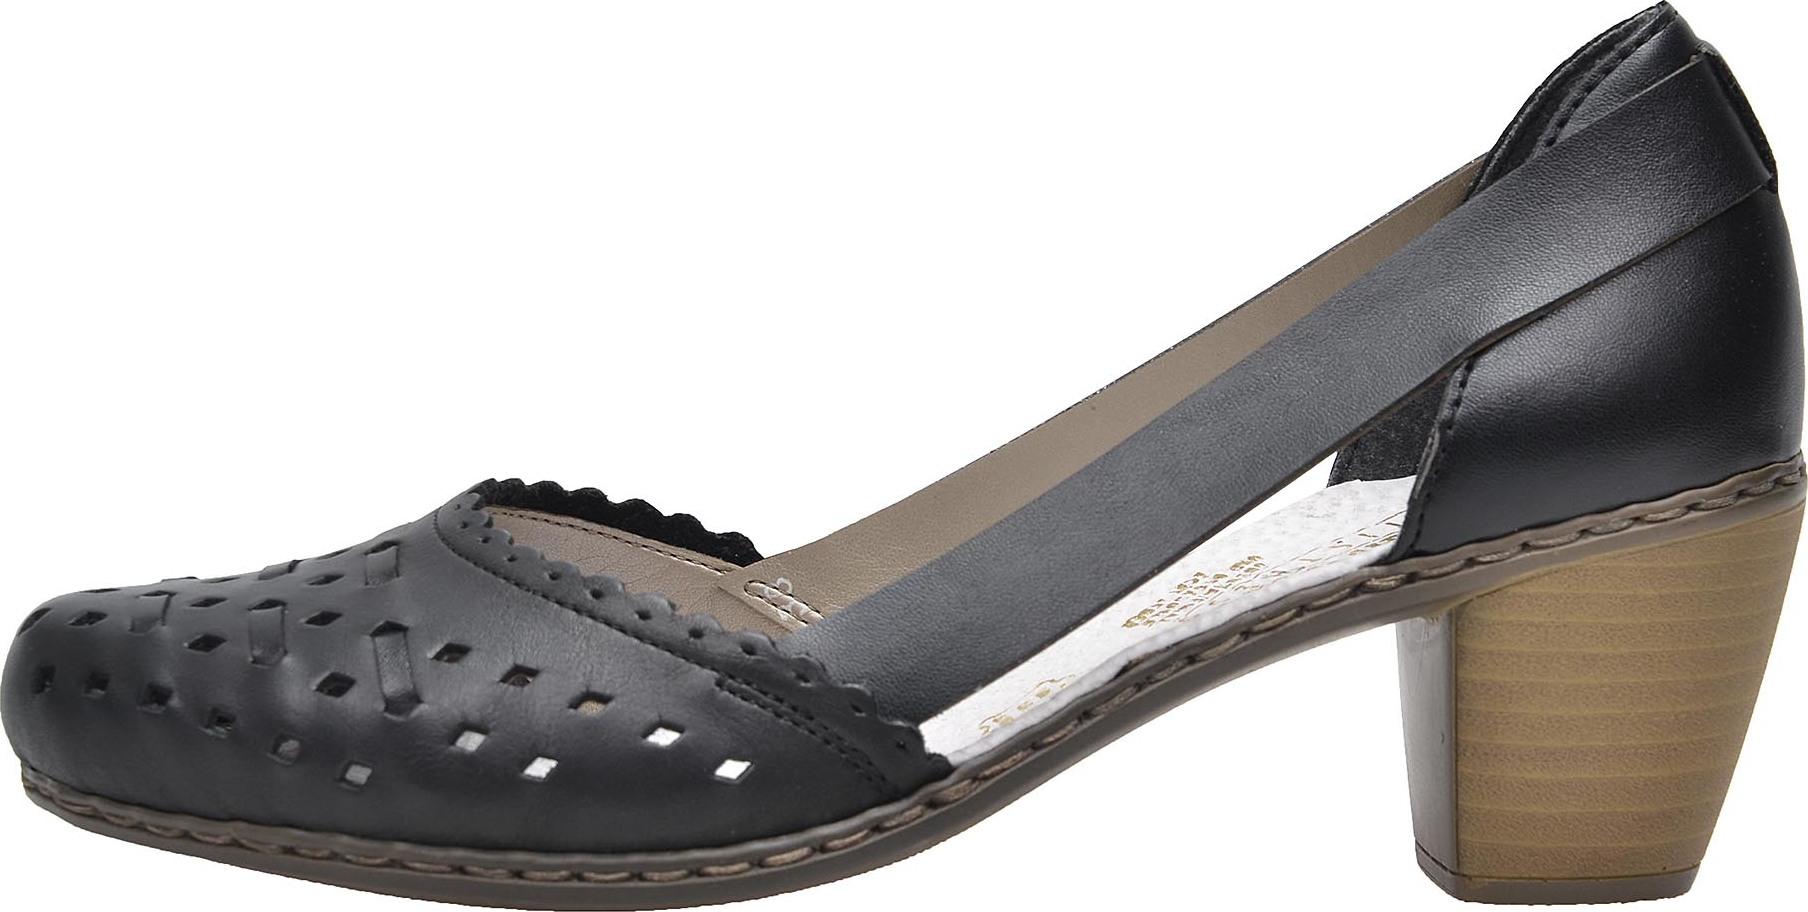 Dámská obuv RIEKER 40985 00 SCHWARZ F S 8 – Rieker Antistress 90aee4d24e